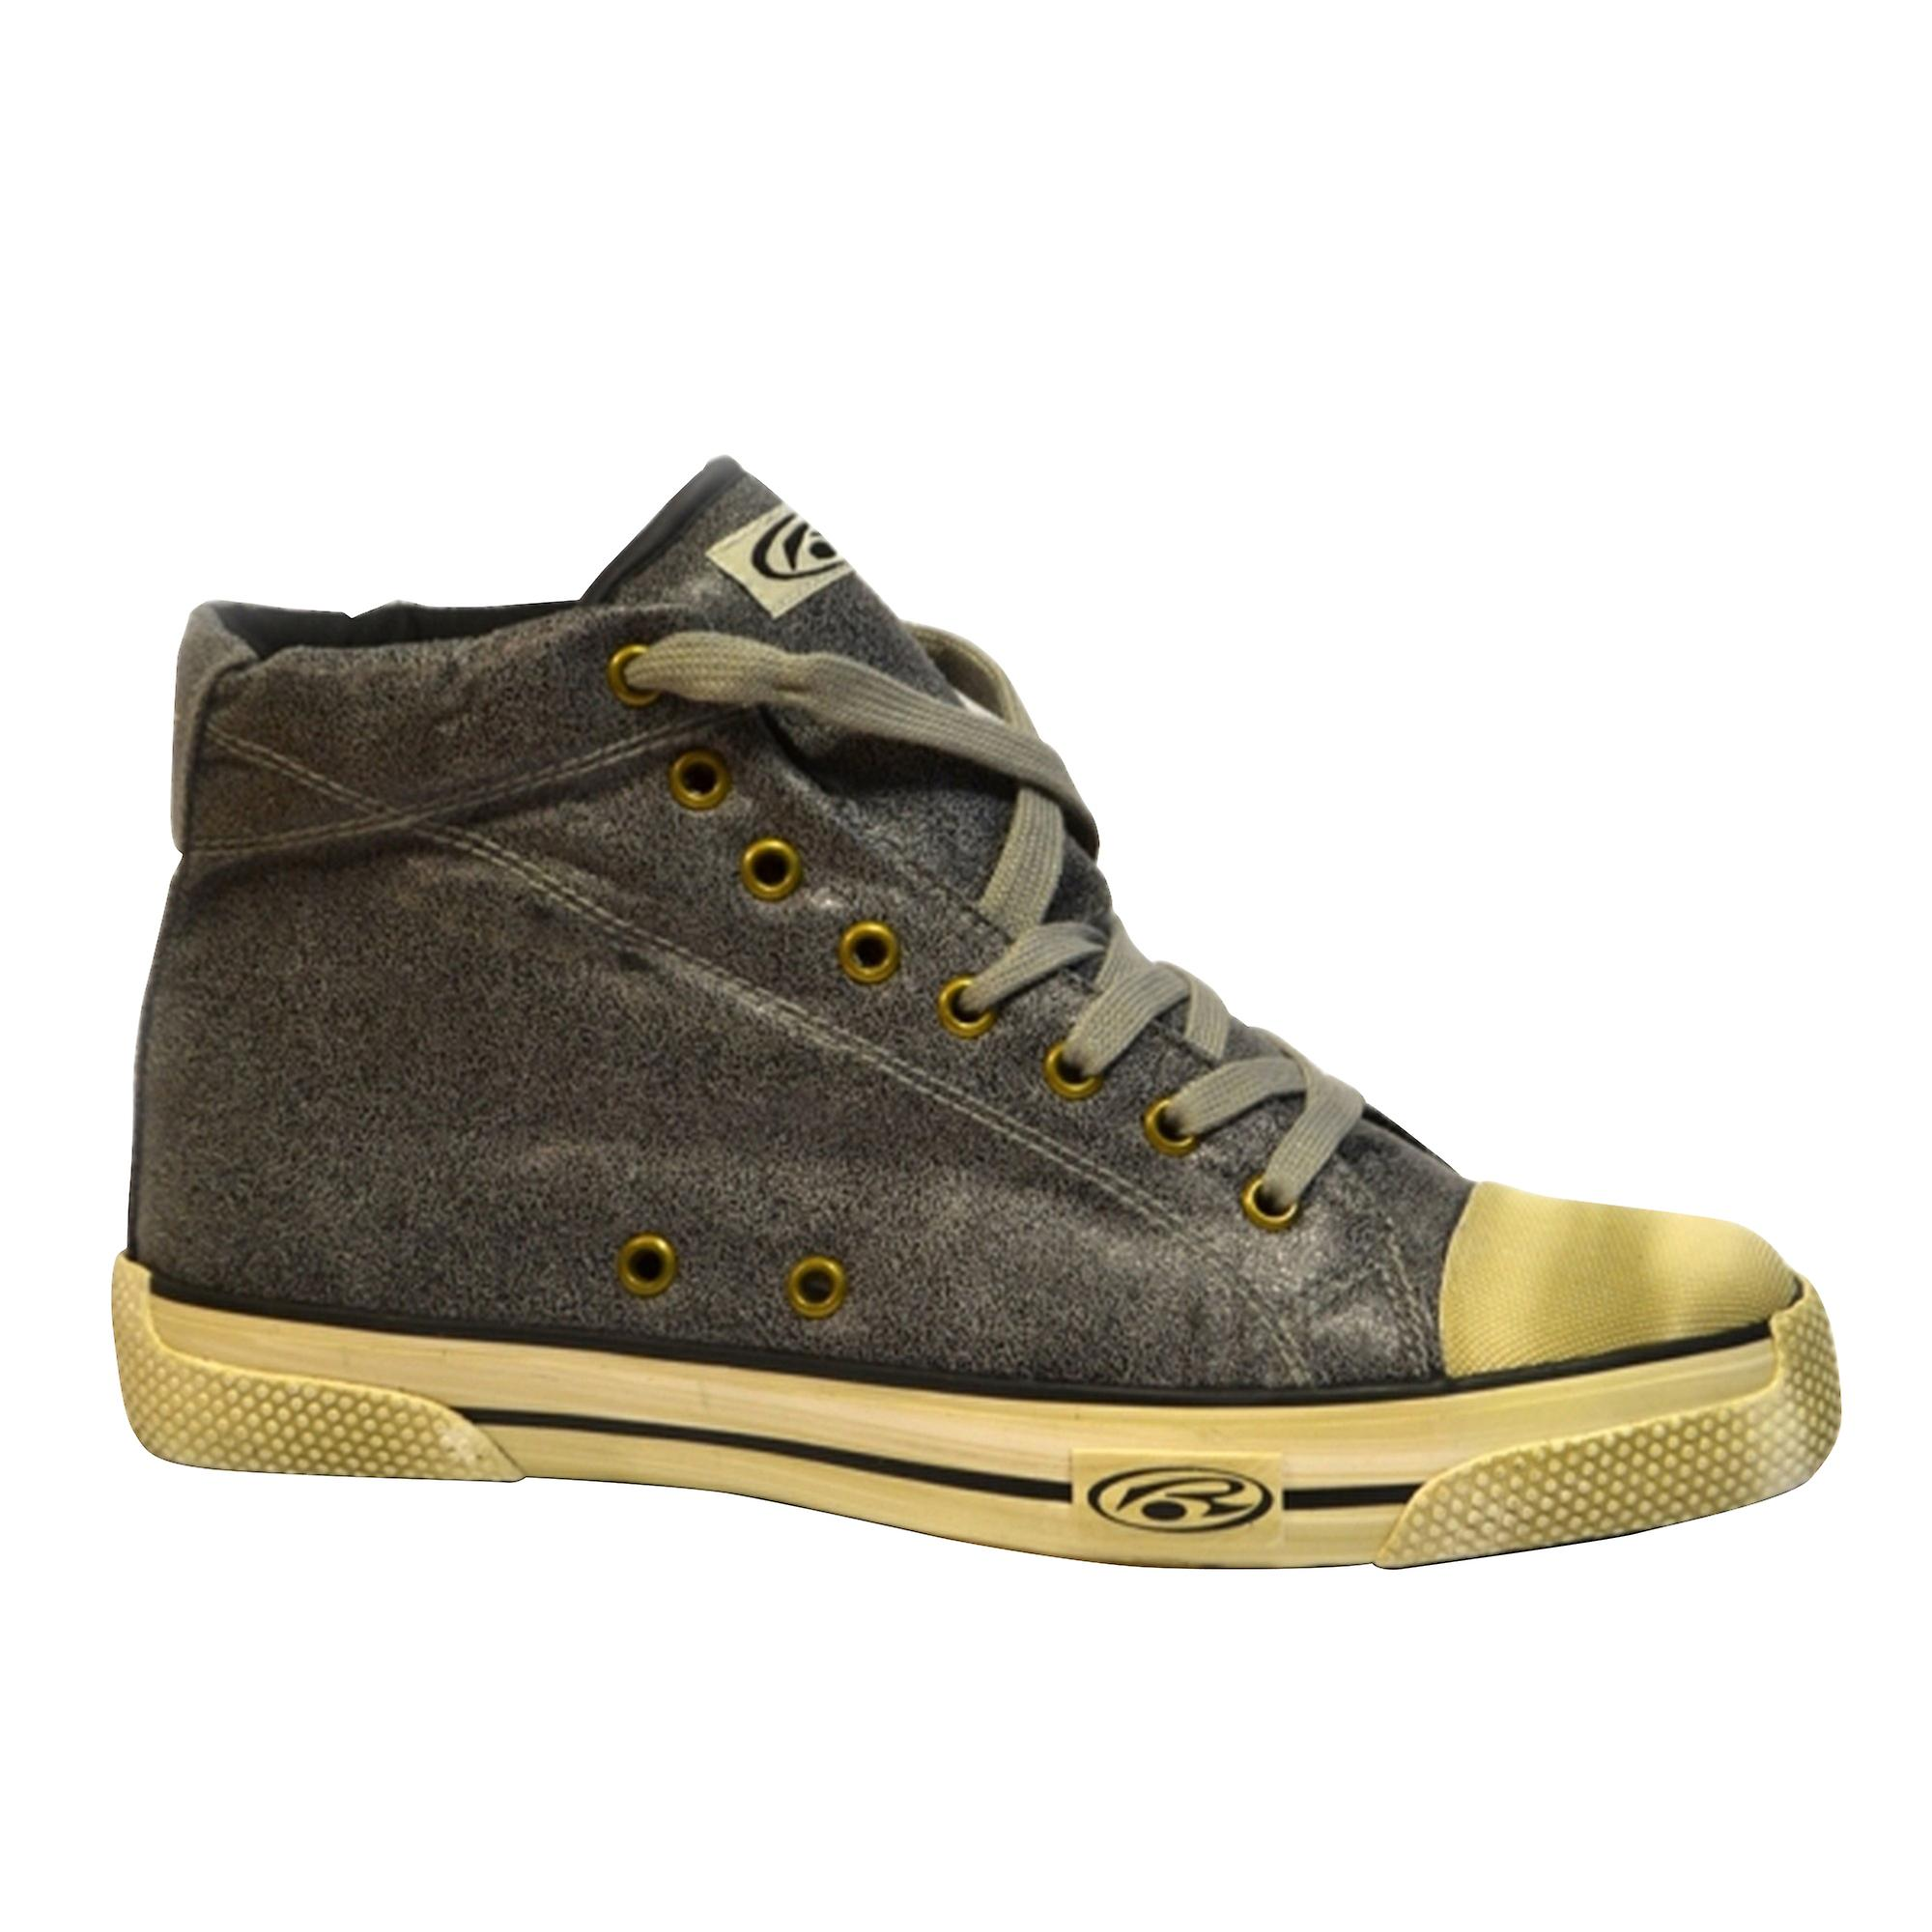 ... rurik antracite leatherette leatherette leatherette angosciato guarda  hightop skate shoes 1dd75b